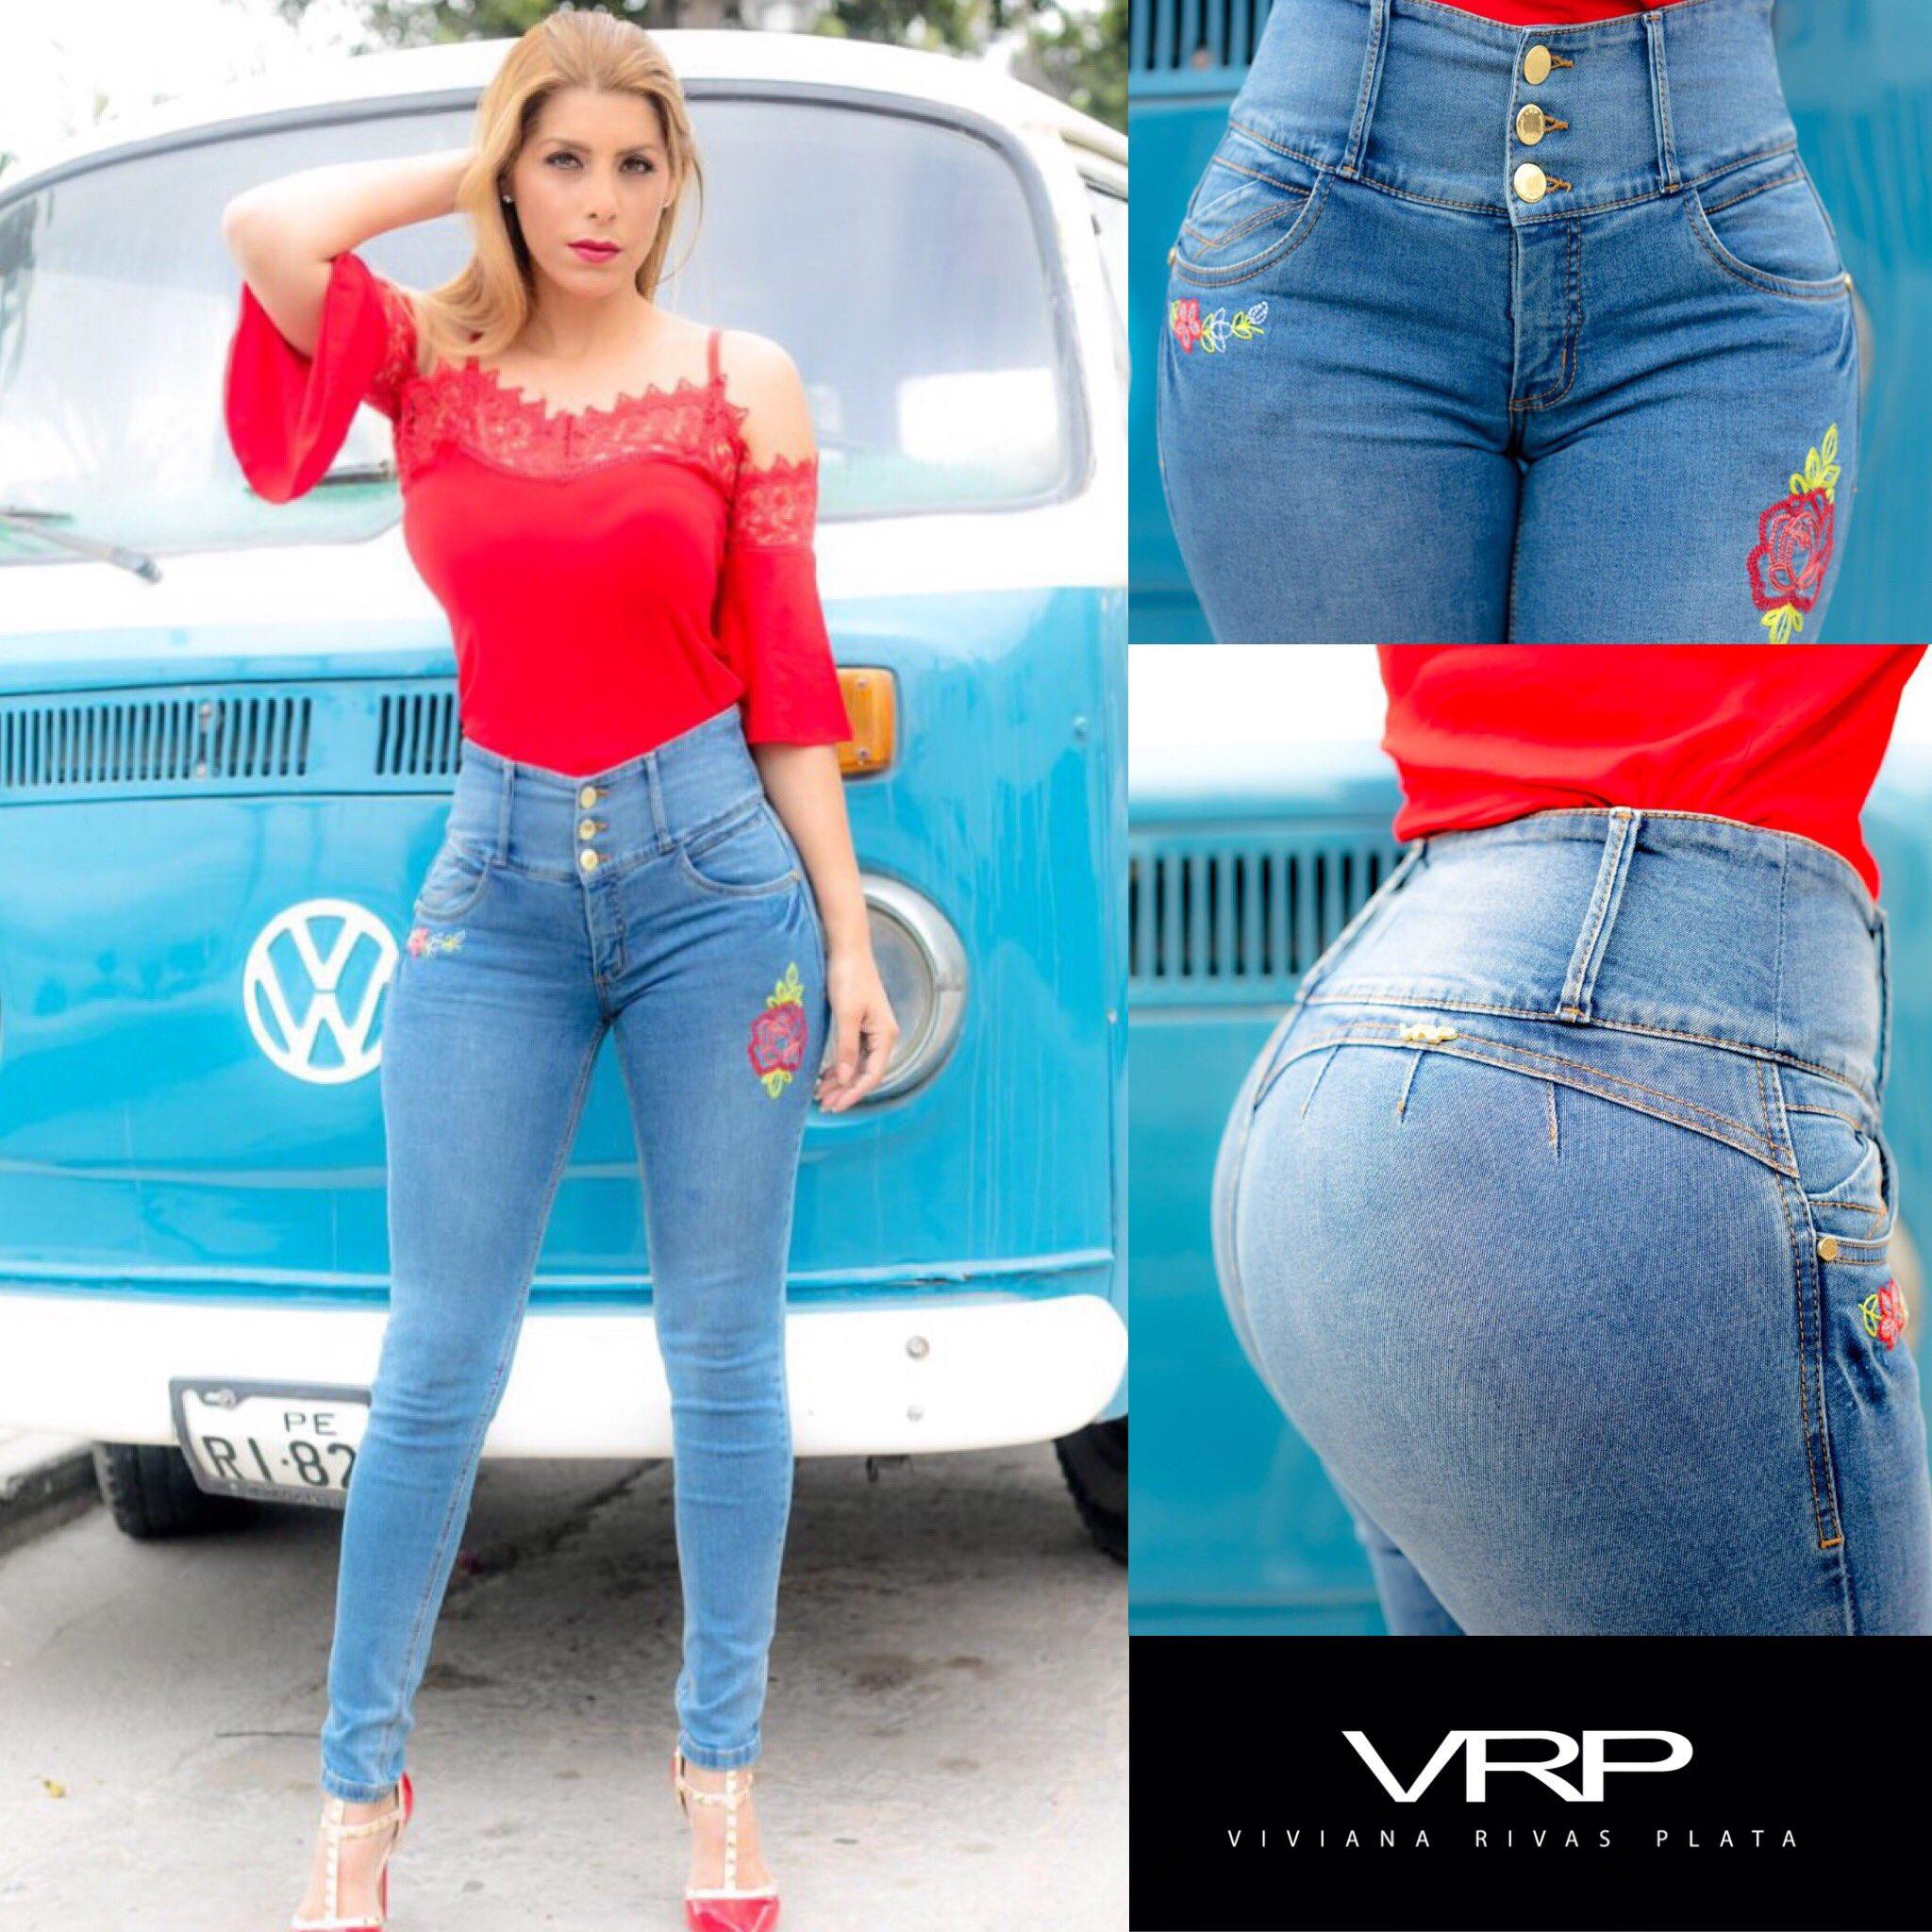 Viviana Rivasplata Nude Photos 41